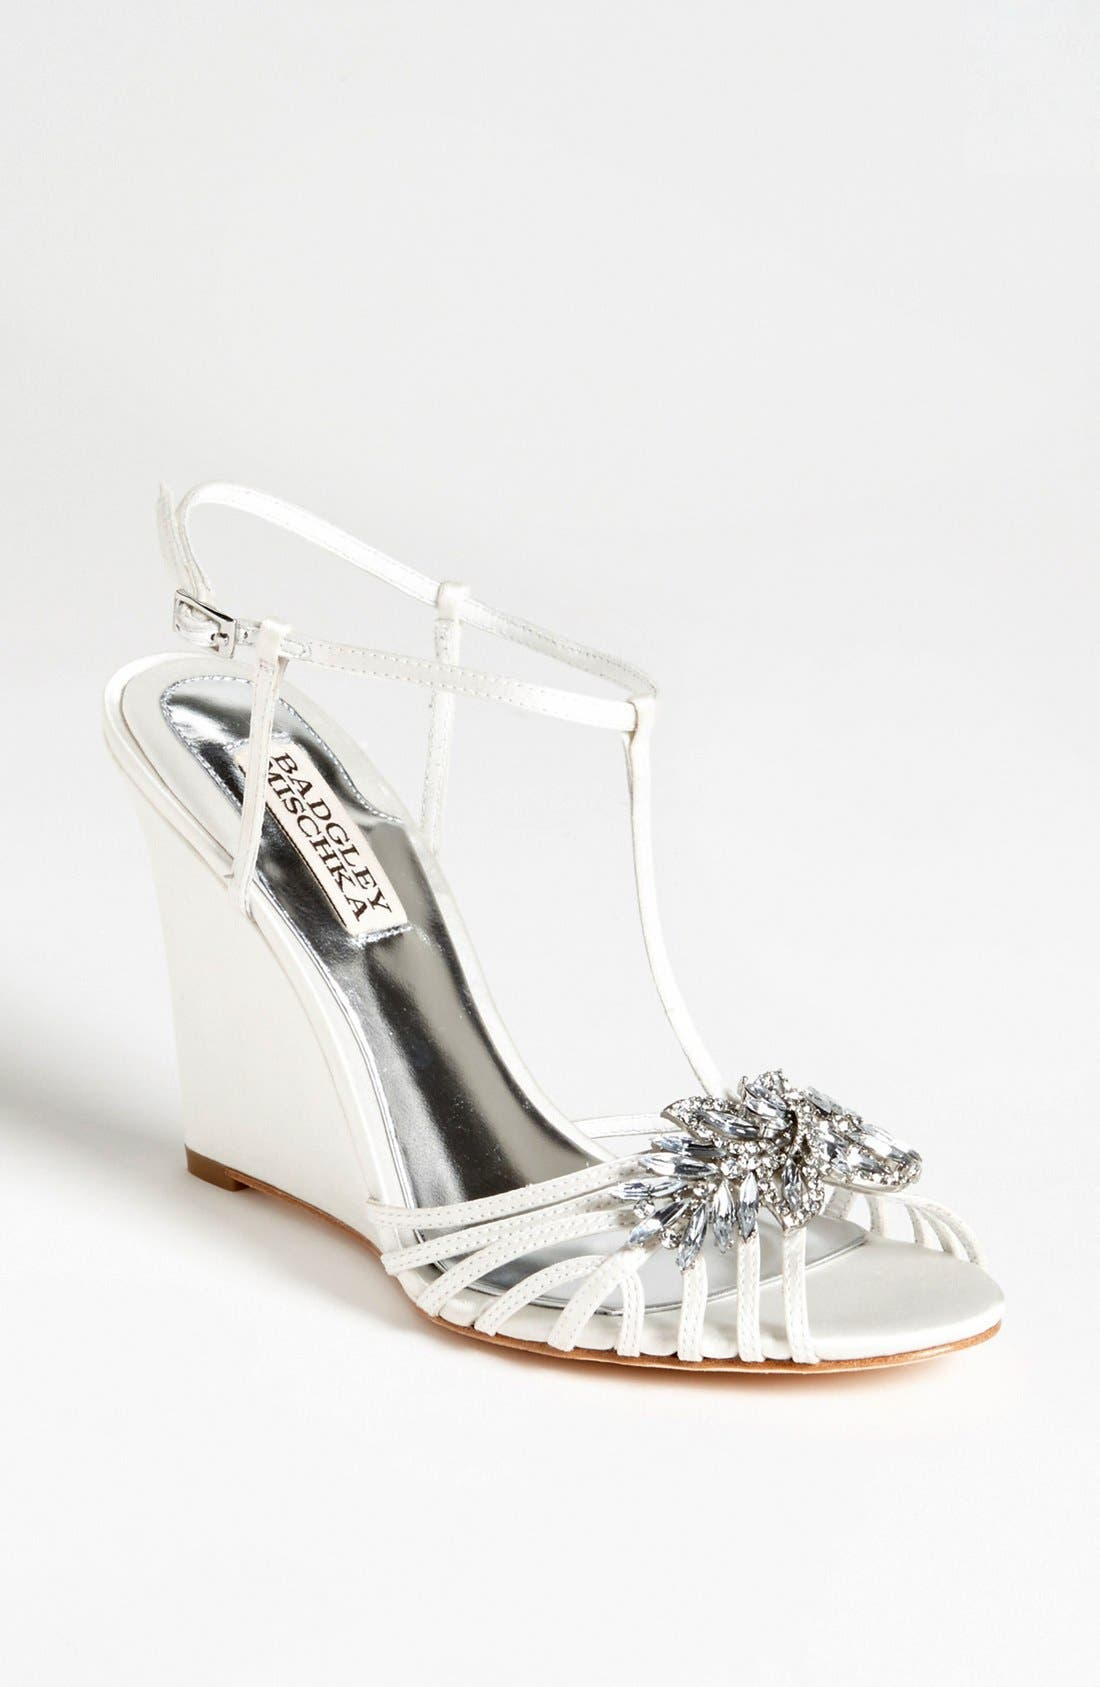 Main Image - Badgley Mischka 'Naomi' Wedge Sandal